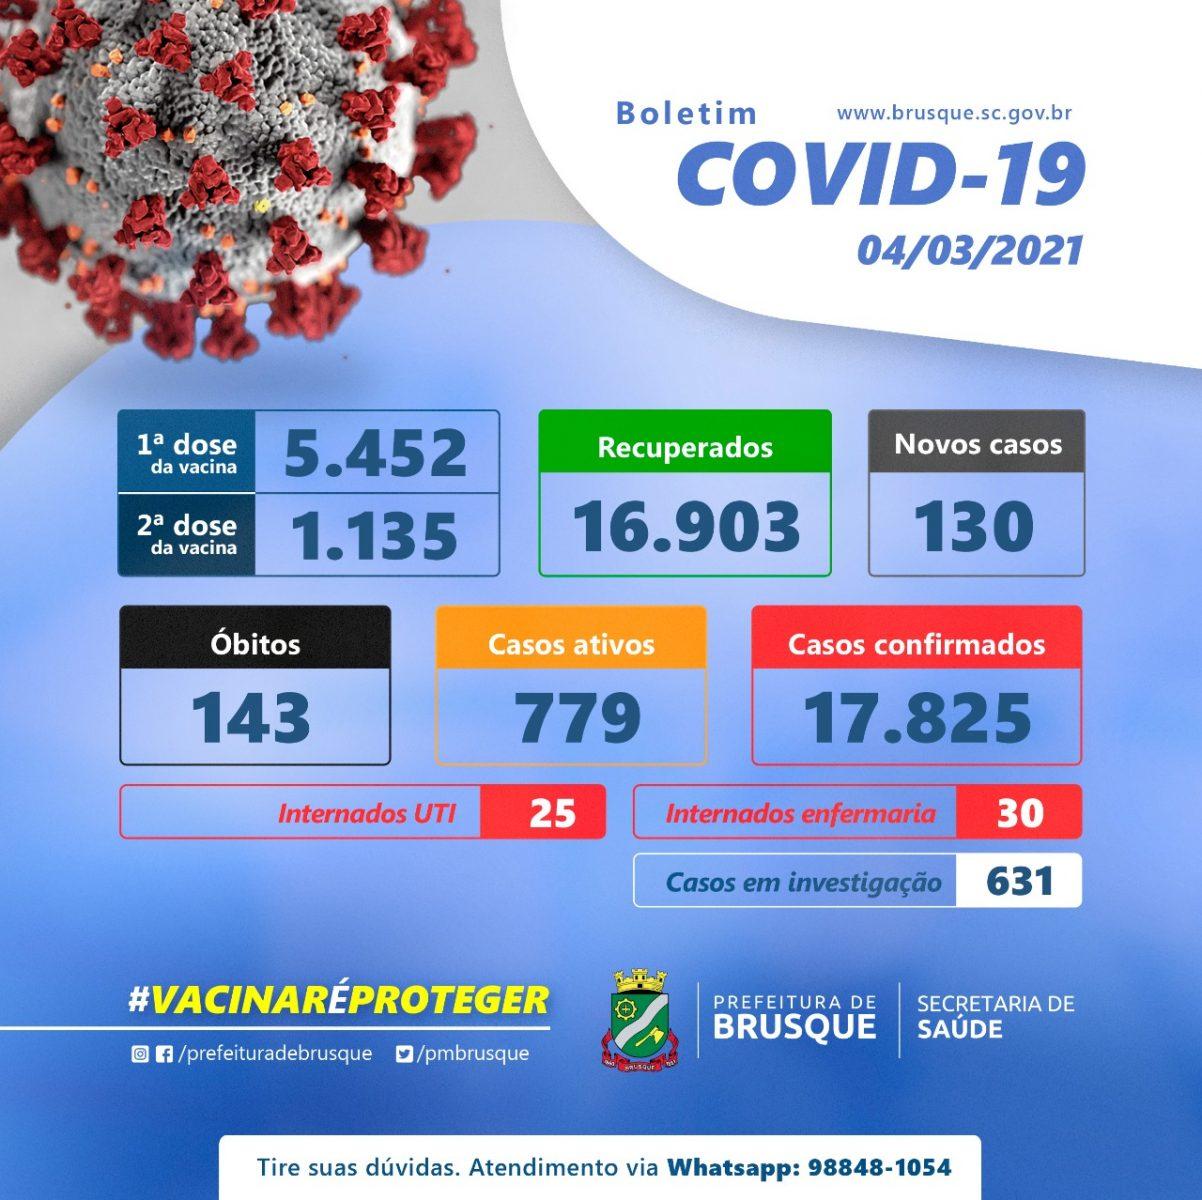 Covid-19: Confira o boletim epidemiológico desta quinta-feira (4)